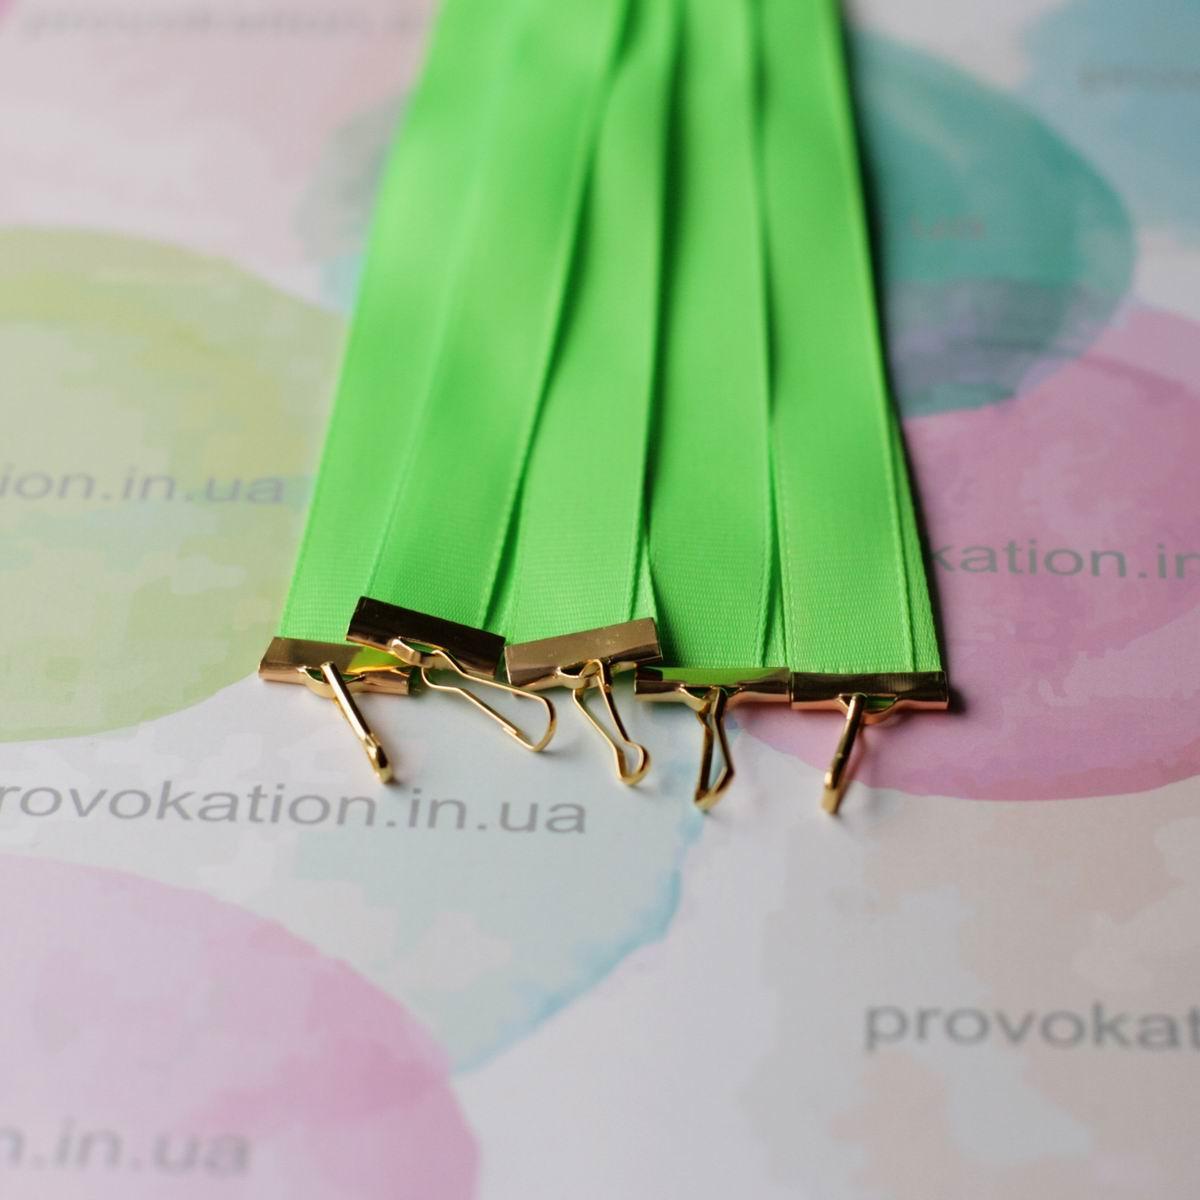 Лента для медалей и наград, Салатовая, 12мм, 65см